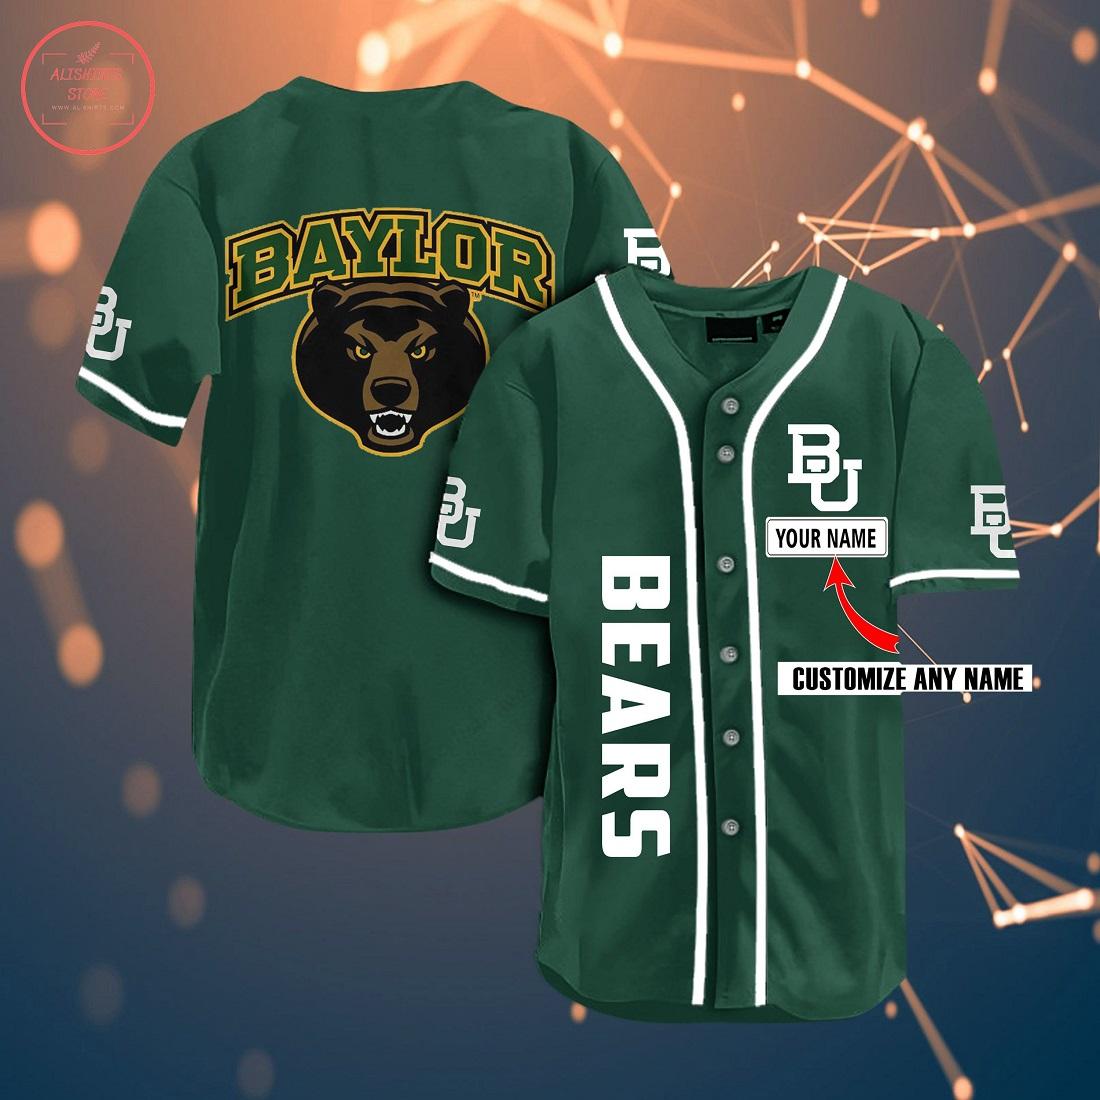 Ncaa Baylor Bears Personalized Name Baseball Jersey